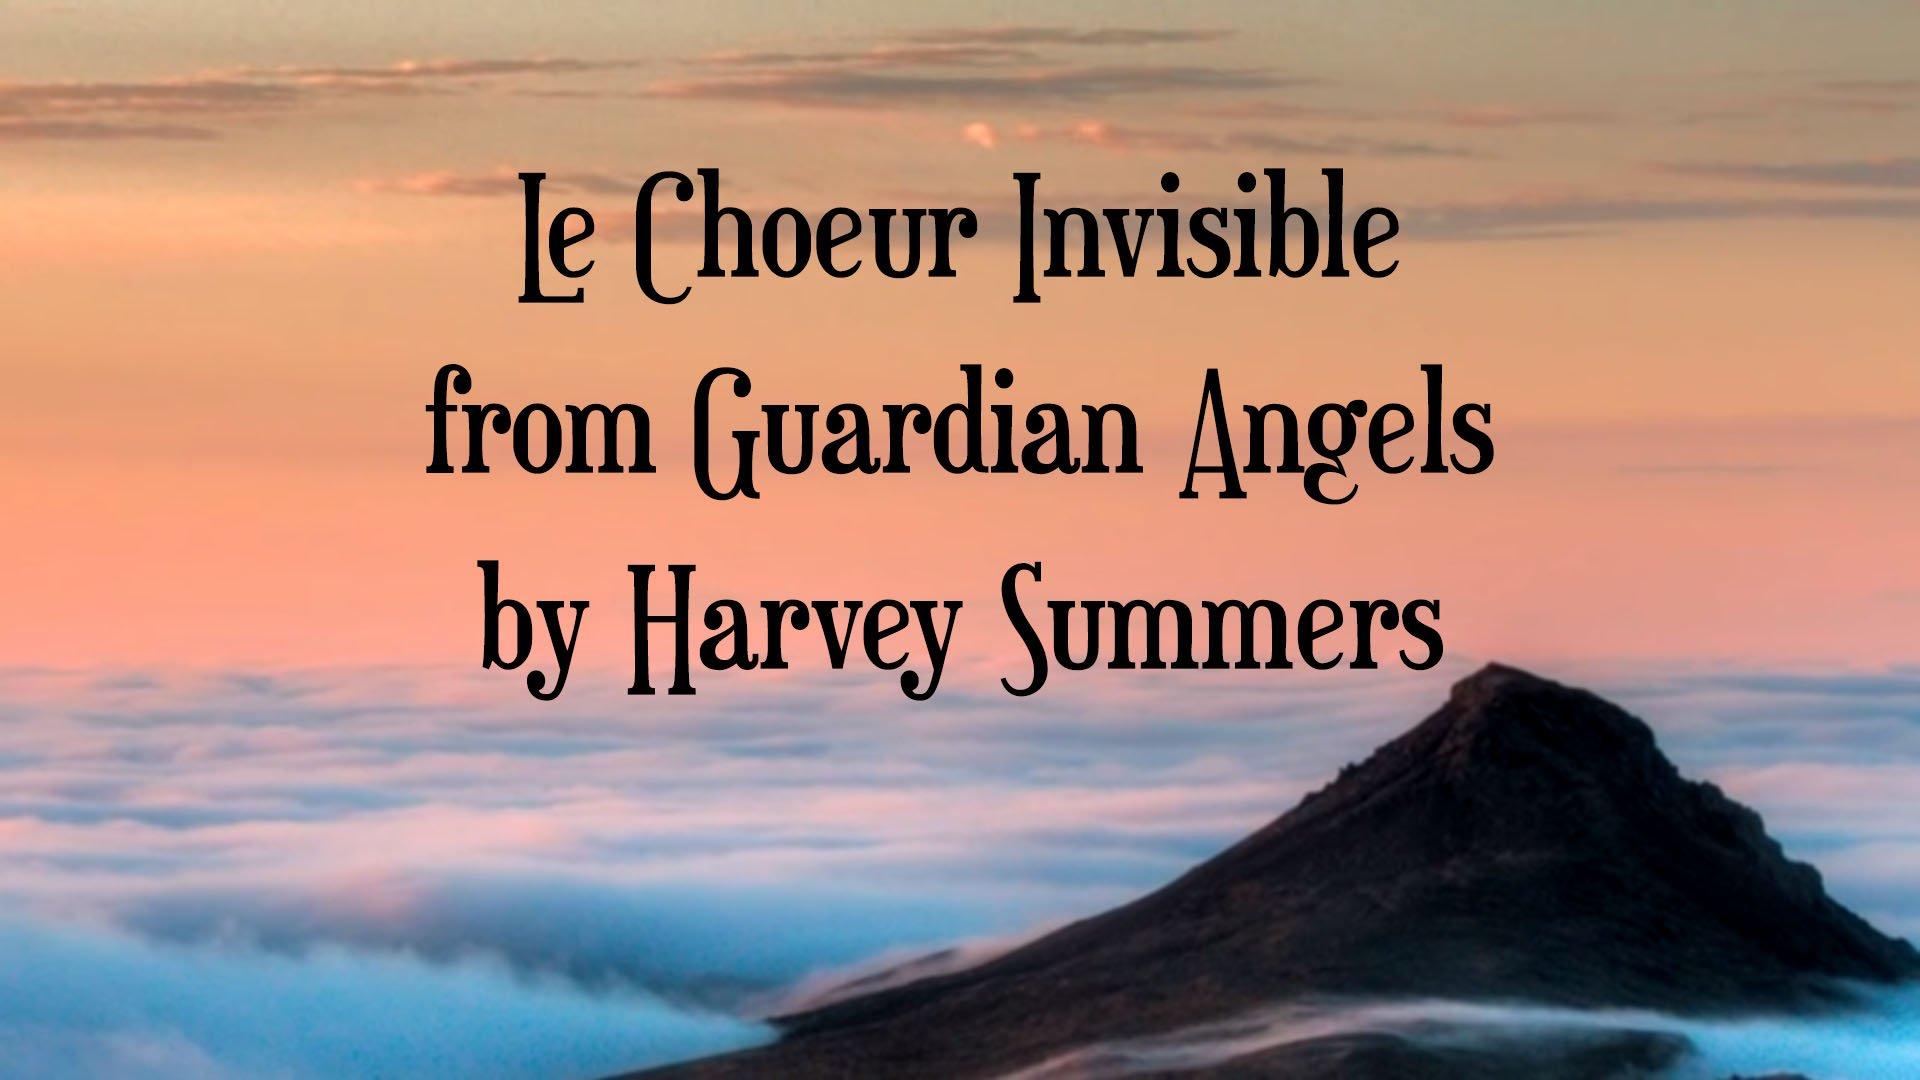 Le Choeur Invisible